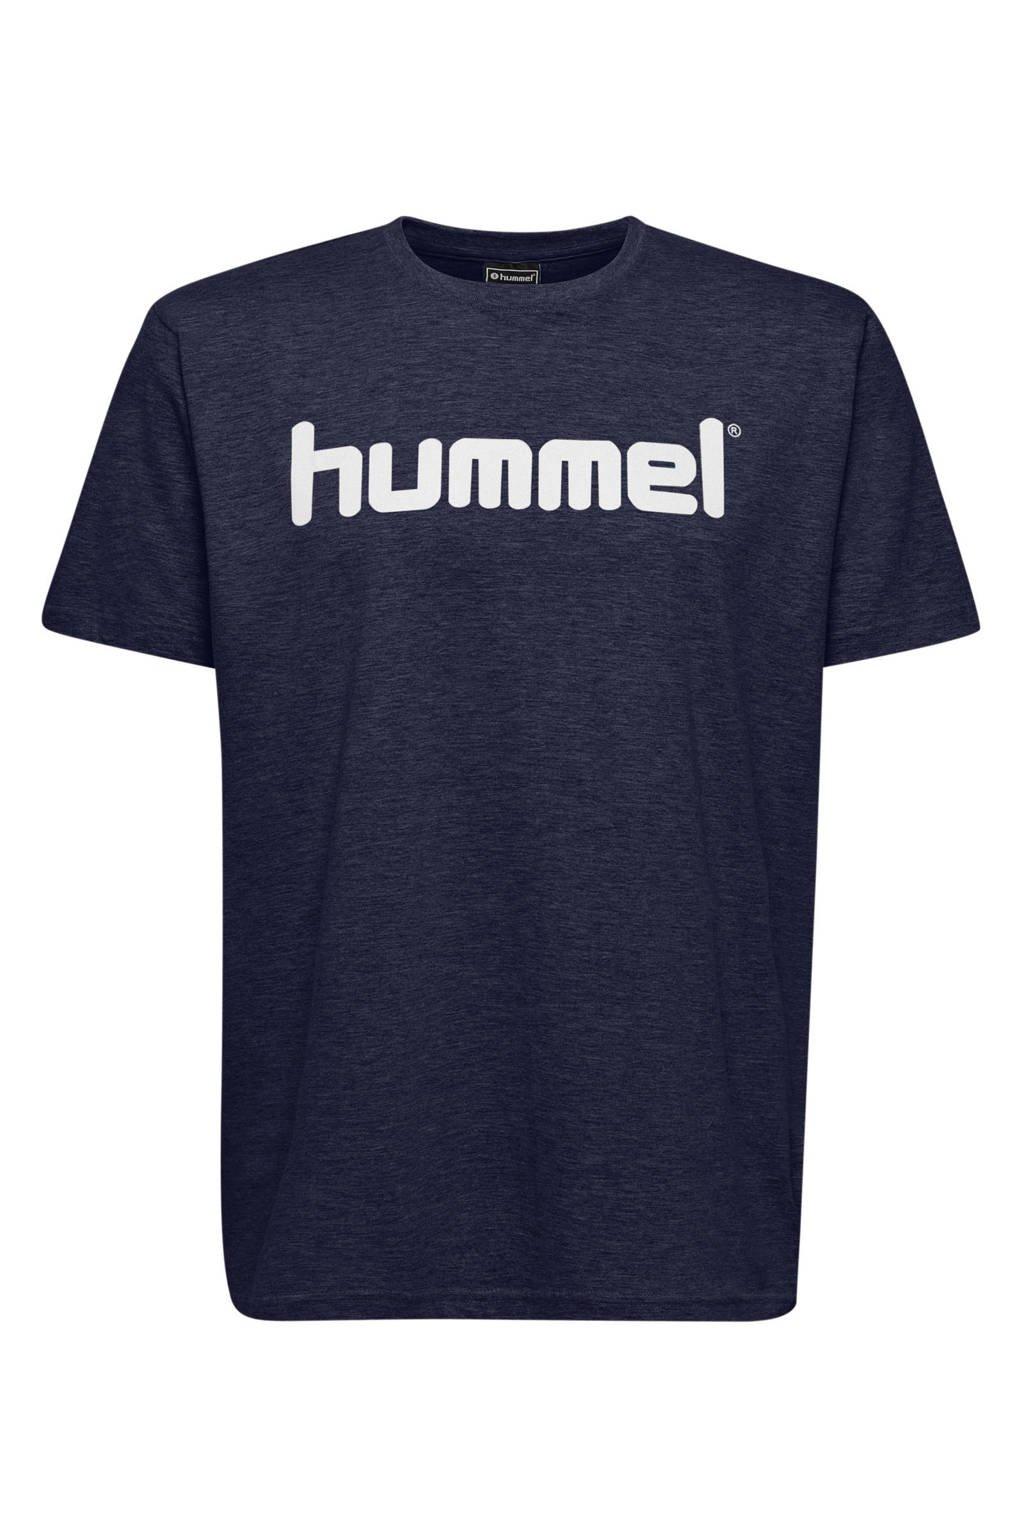 hummel T-shirt met logo donkerblauw, Donkerblauw